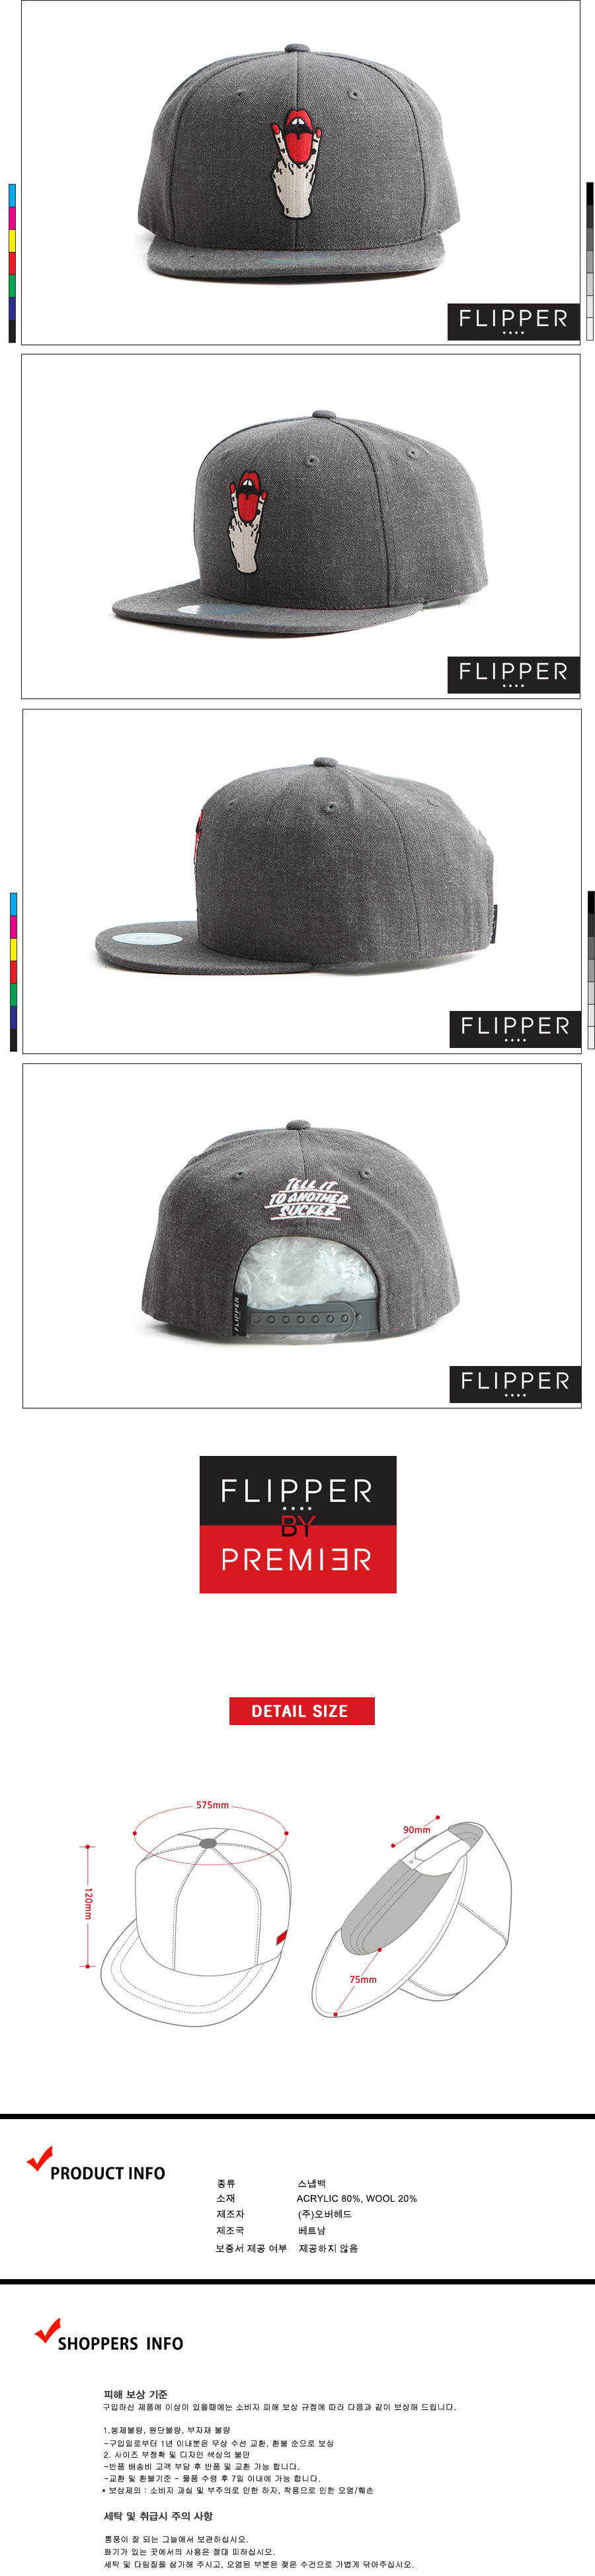 [ PREMIER ] [Premier] Flipper Snapback V Finger Charcoal (FL122)